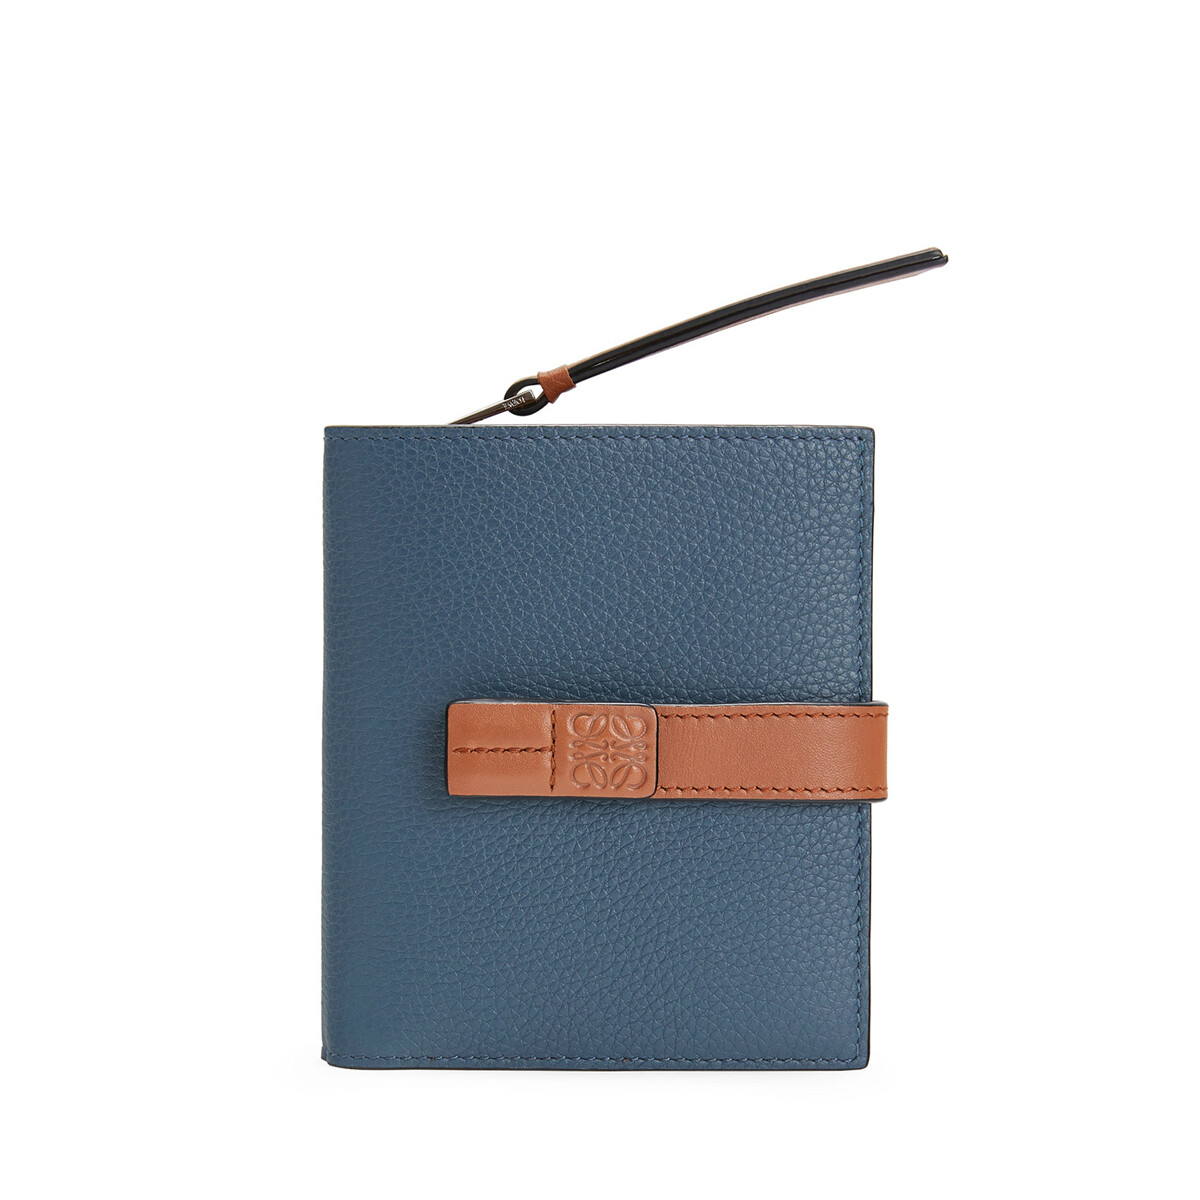 LOEWE コンパクト ジップ ウォレット Steel Blue/Tan front